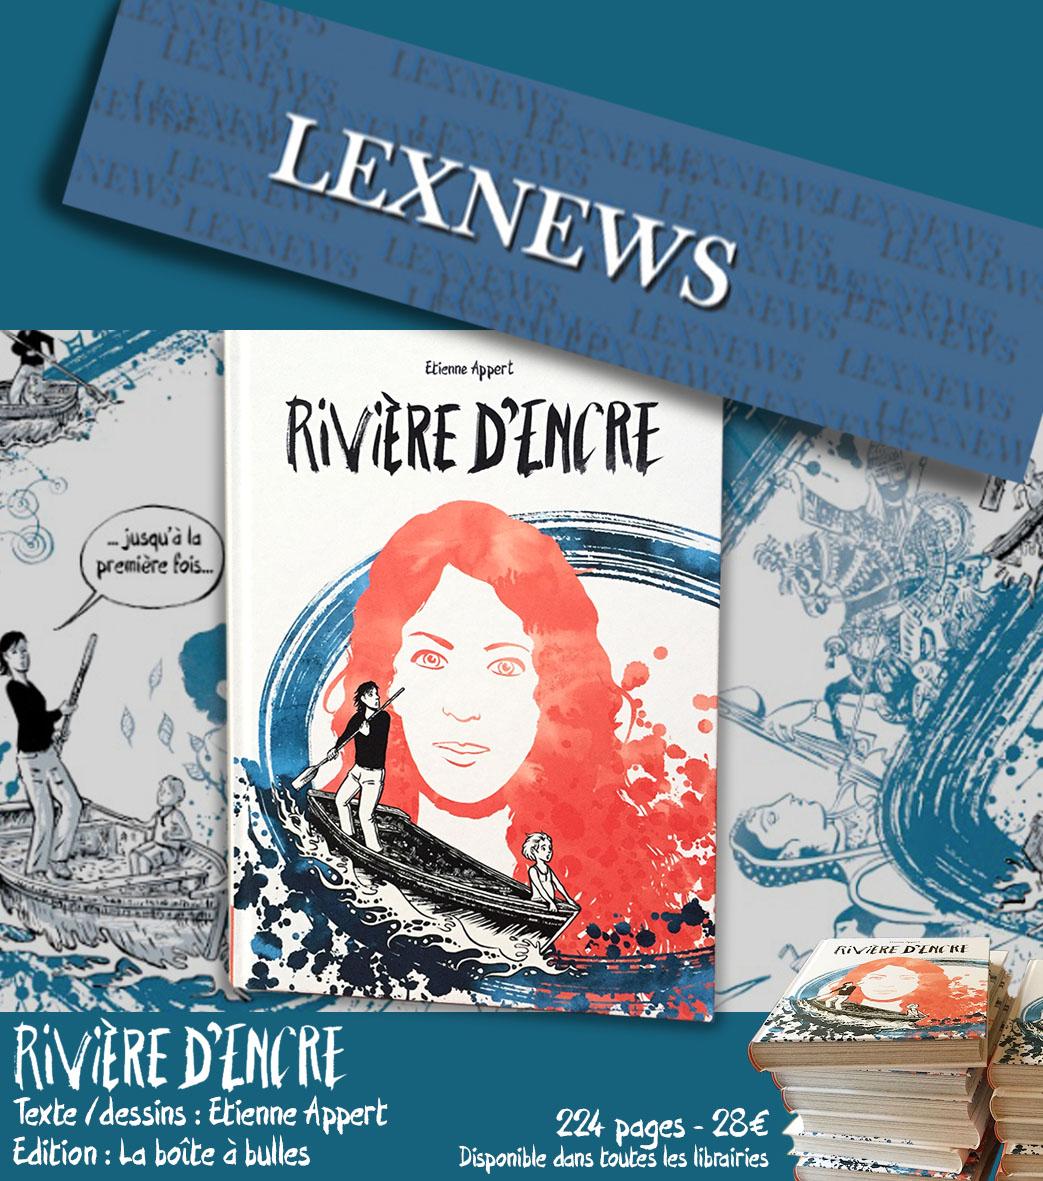 Rivieredencre Etienne Appert LX News